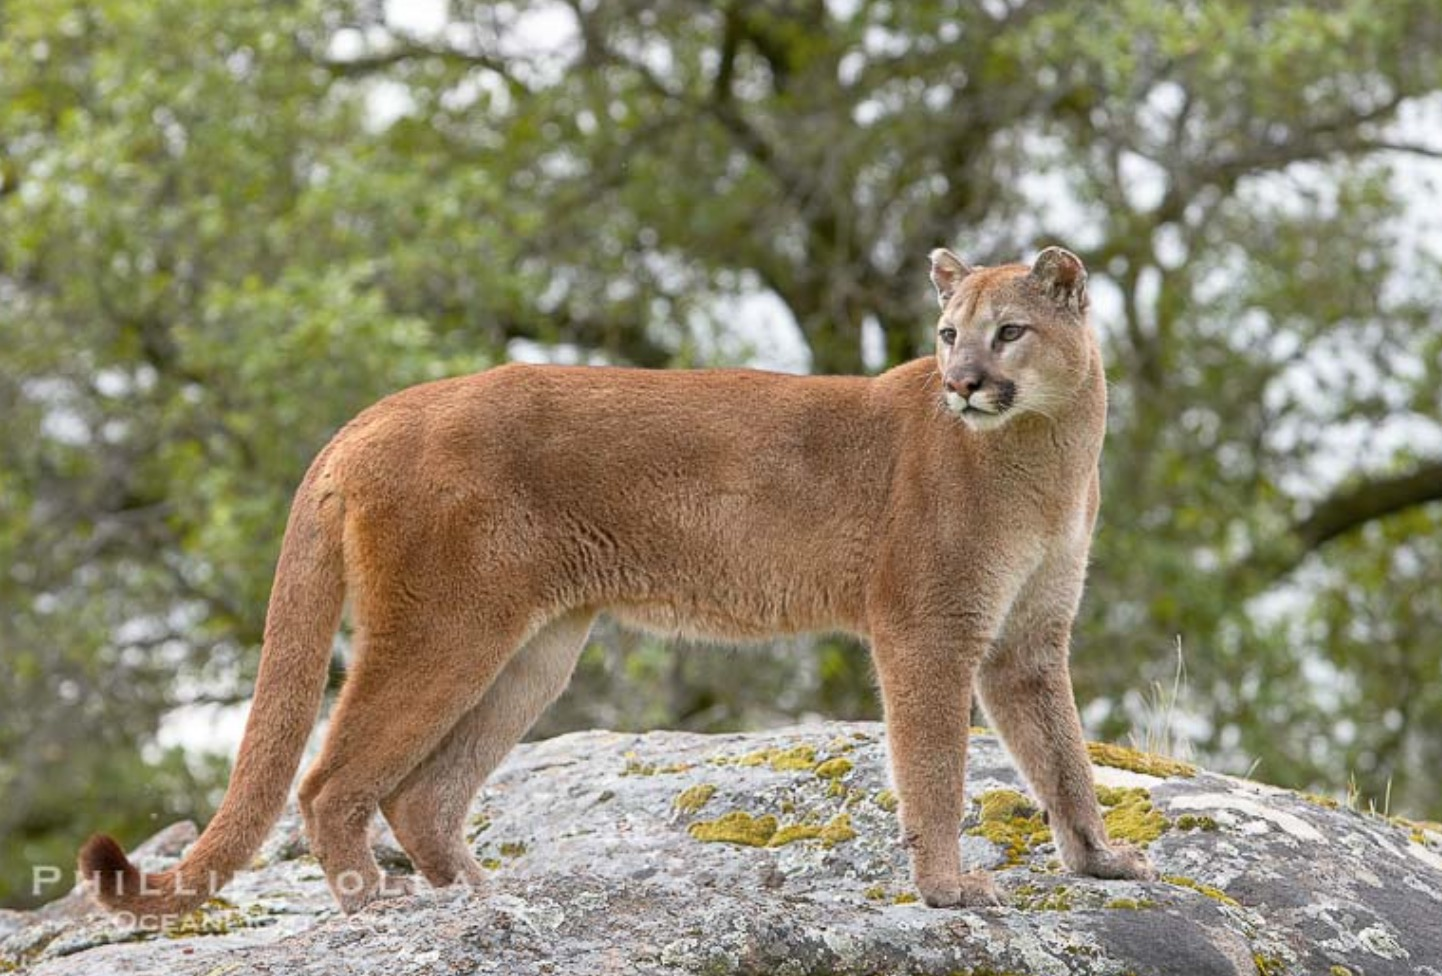 33-Puma concolor.JPEG